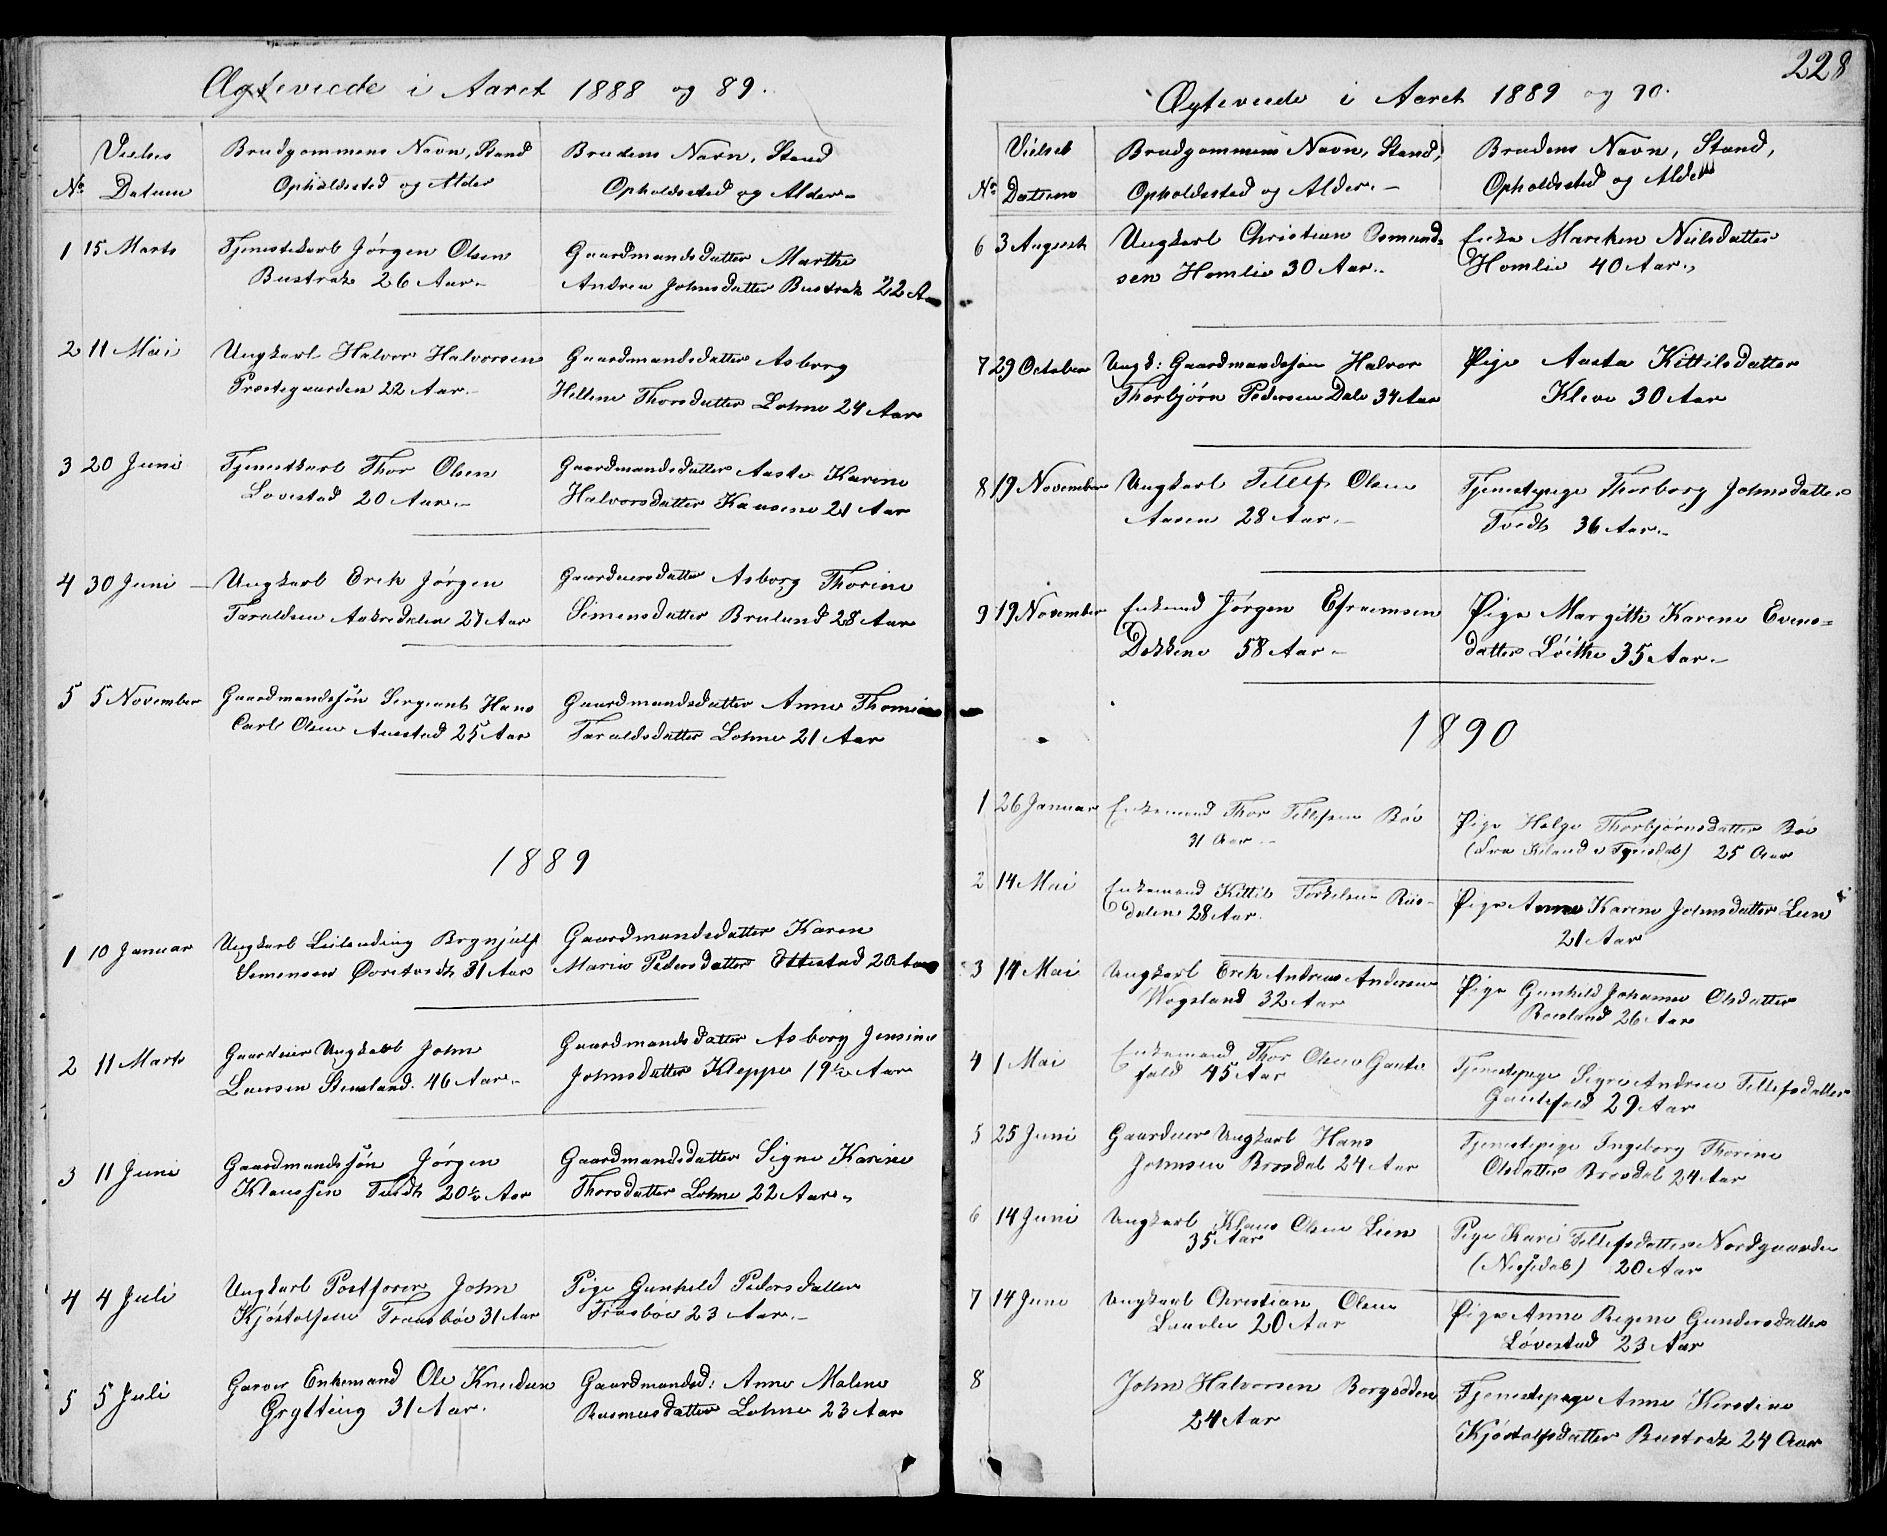 SAKO, Drangedal kirkebøker, G/Gb/L0001: Klokkerbok nr. II 1, 1856-1894, s. 228